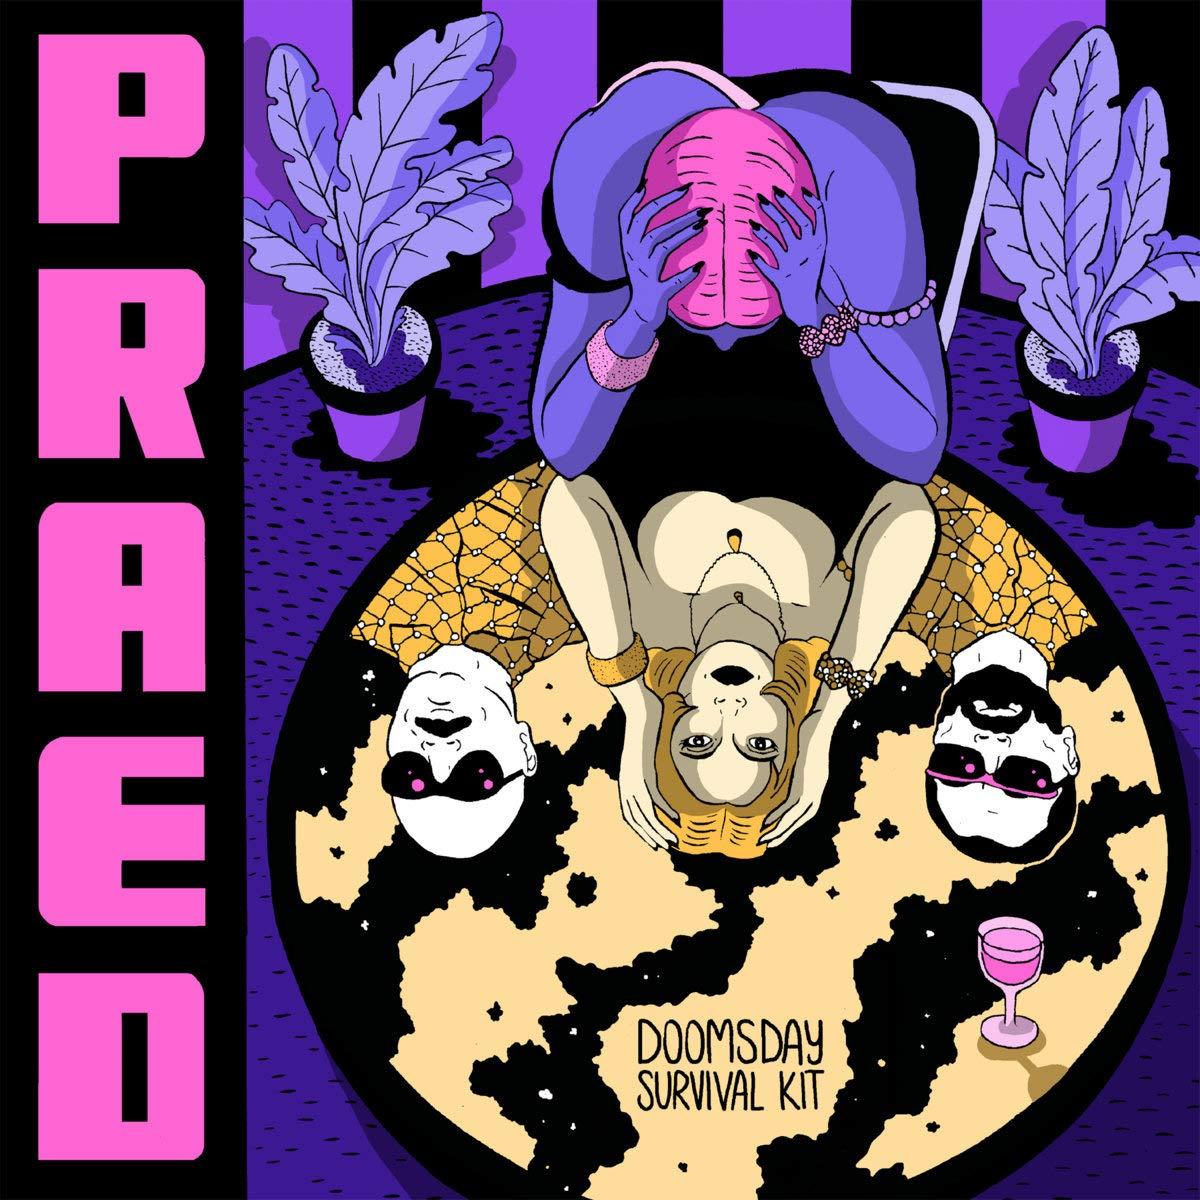 Praed - Doomsday Survival Kit